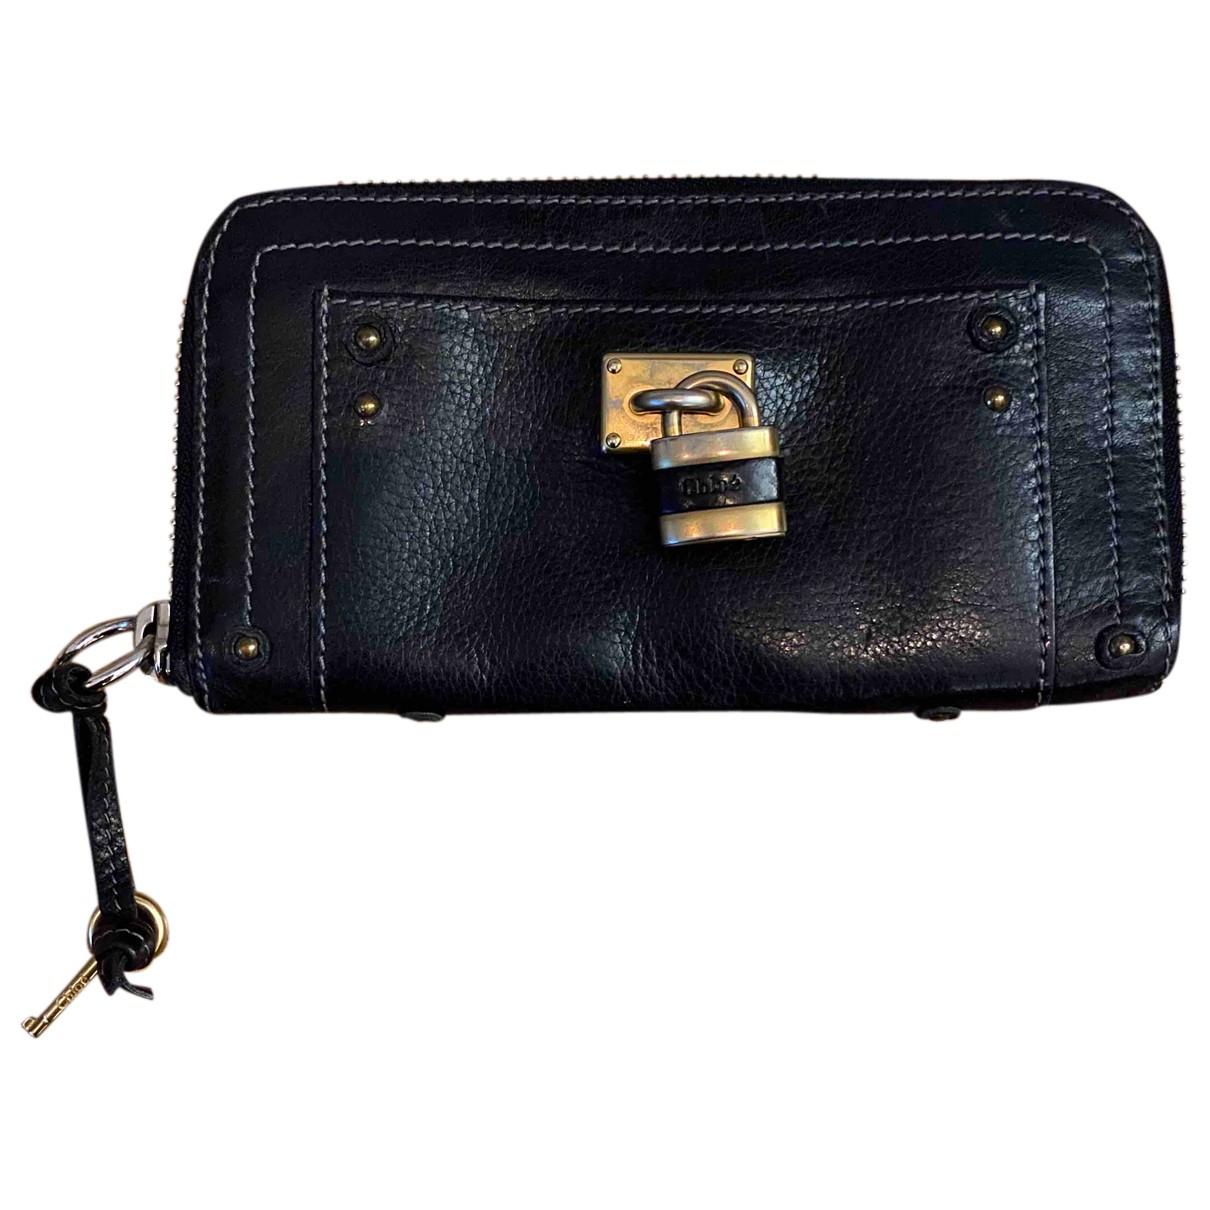 Chloé N Black Leather wallet for Women N